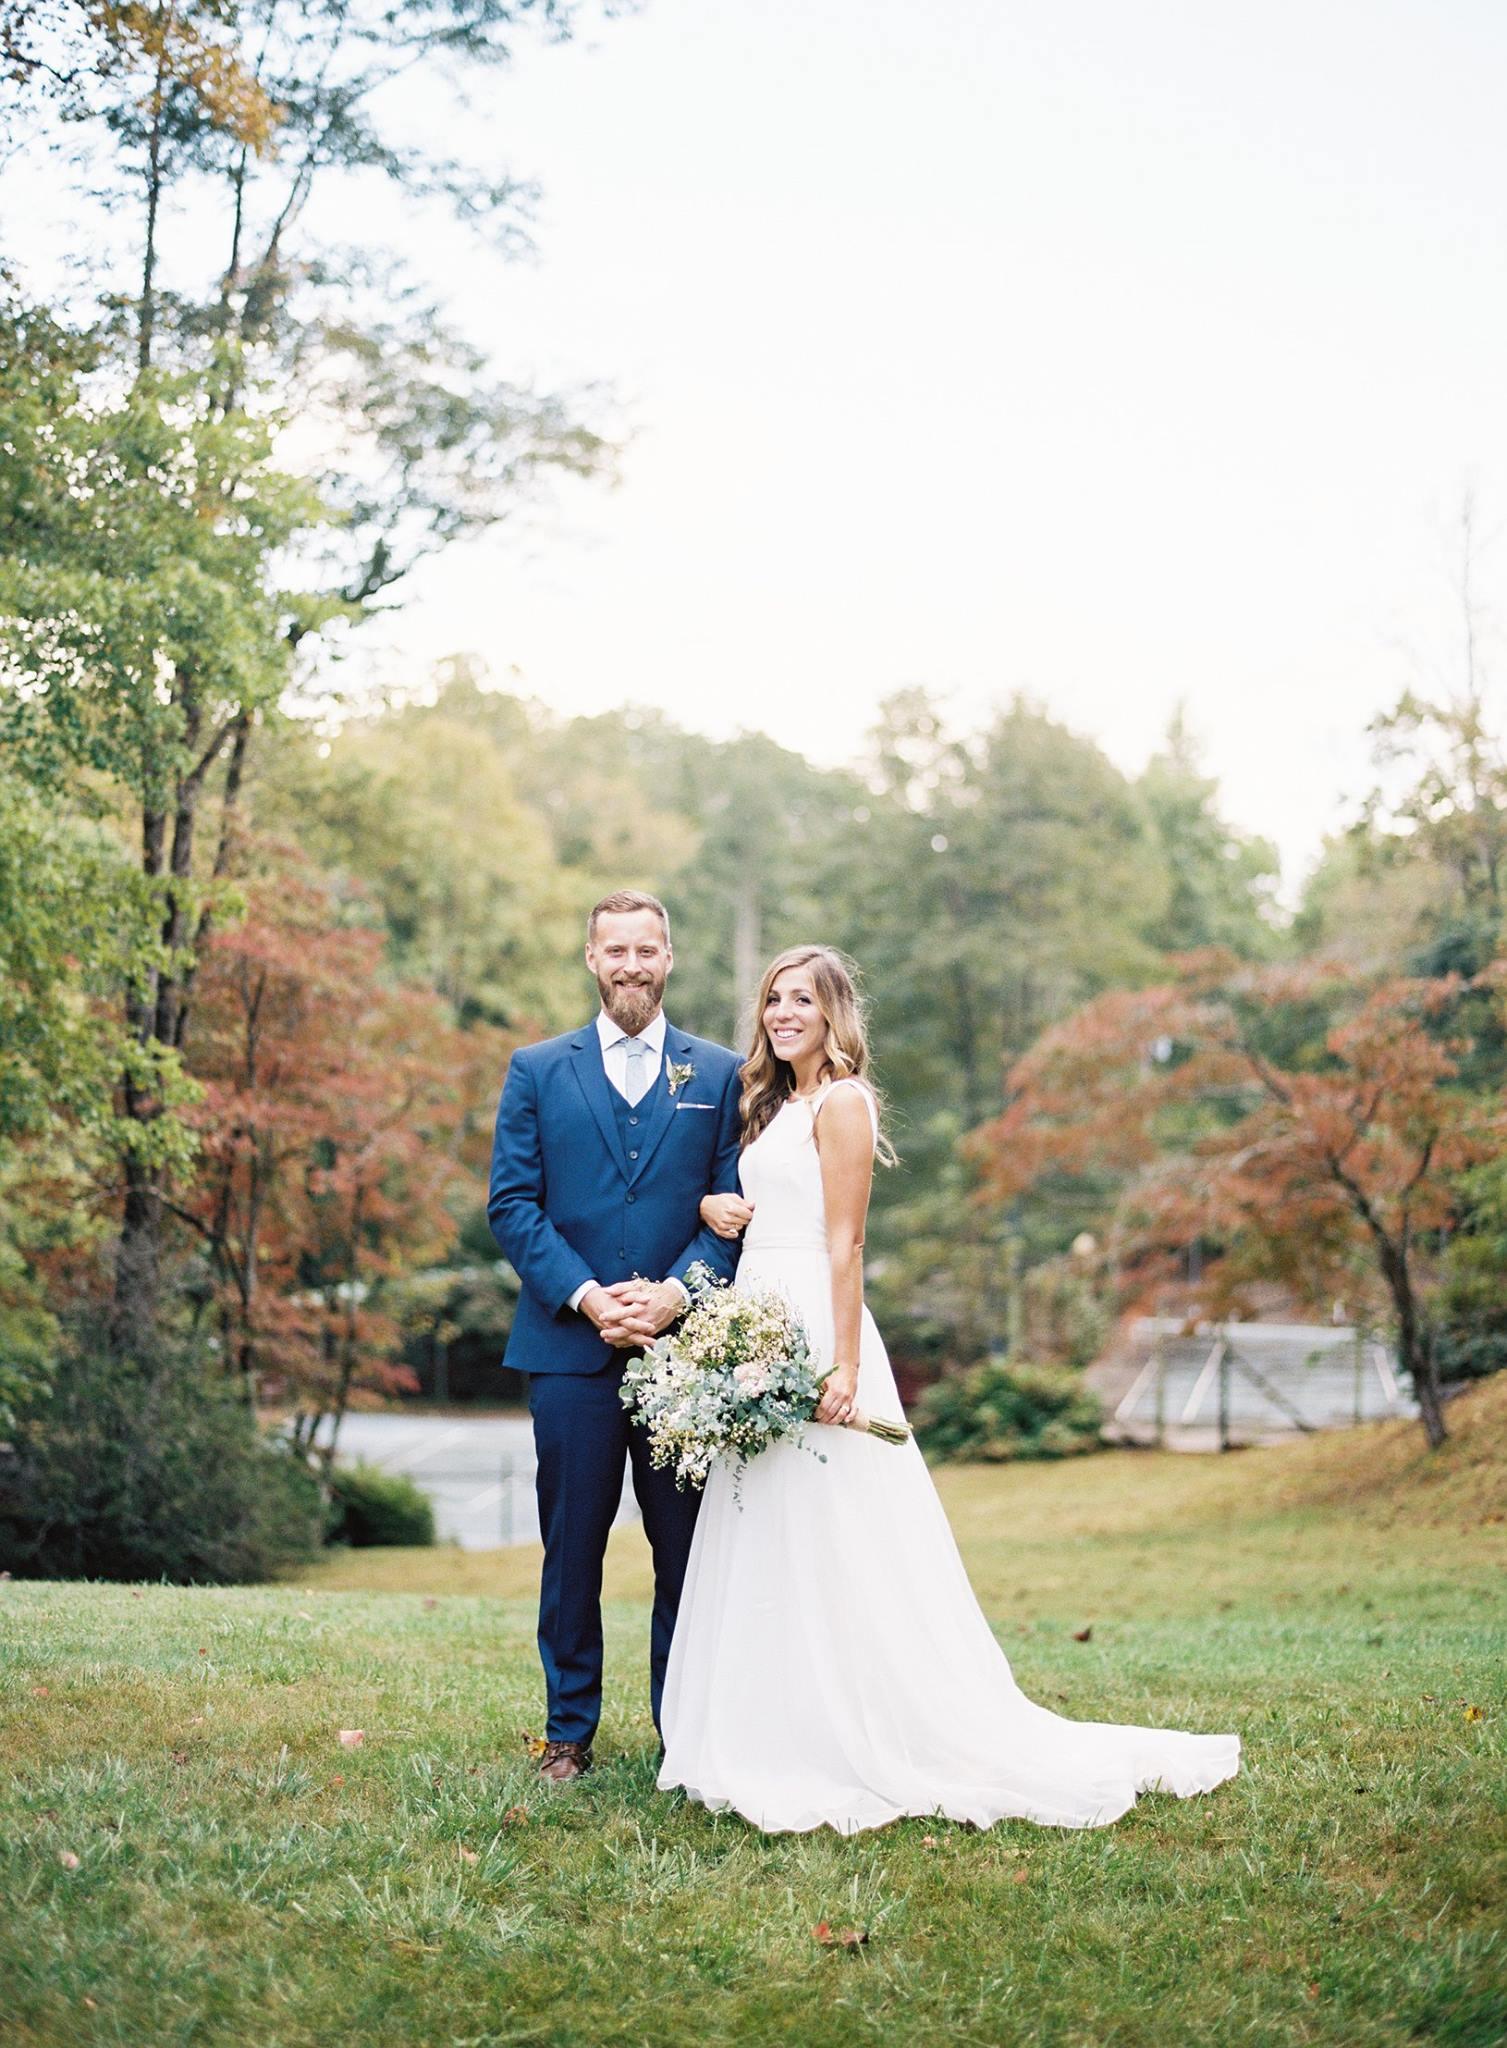 Nash Roberts and Beth Quinton